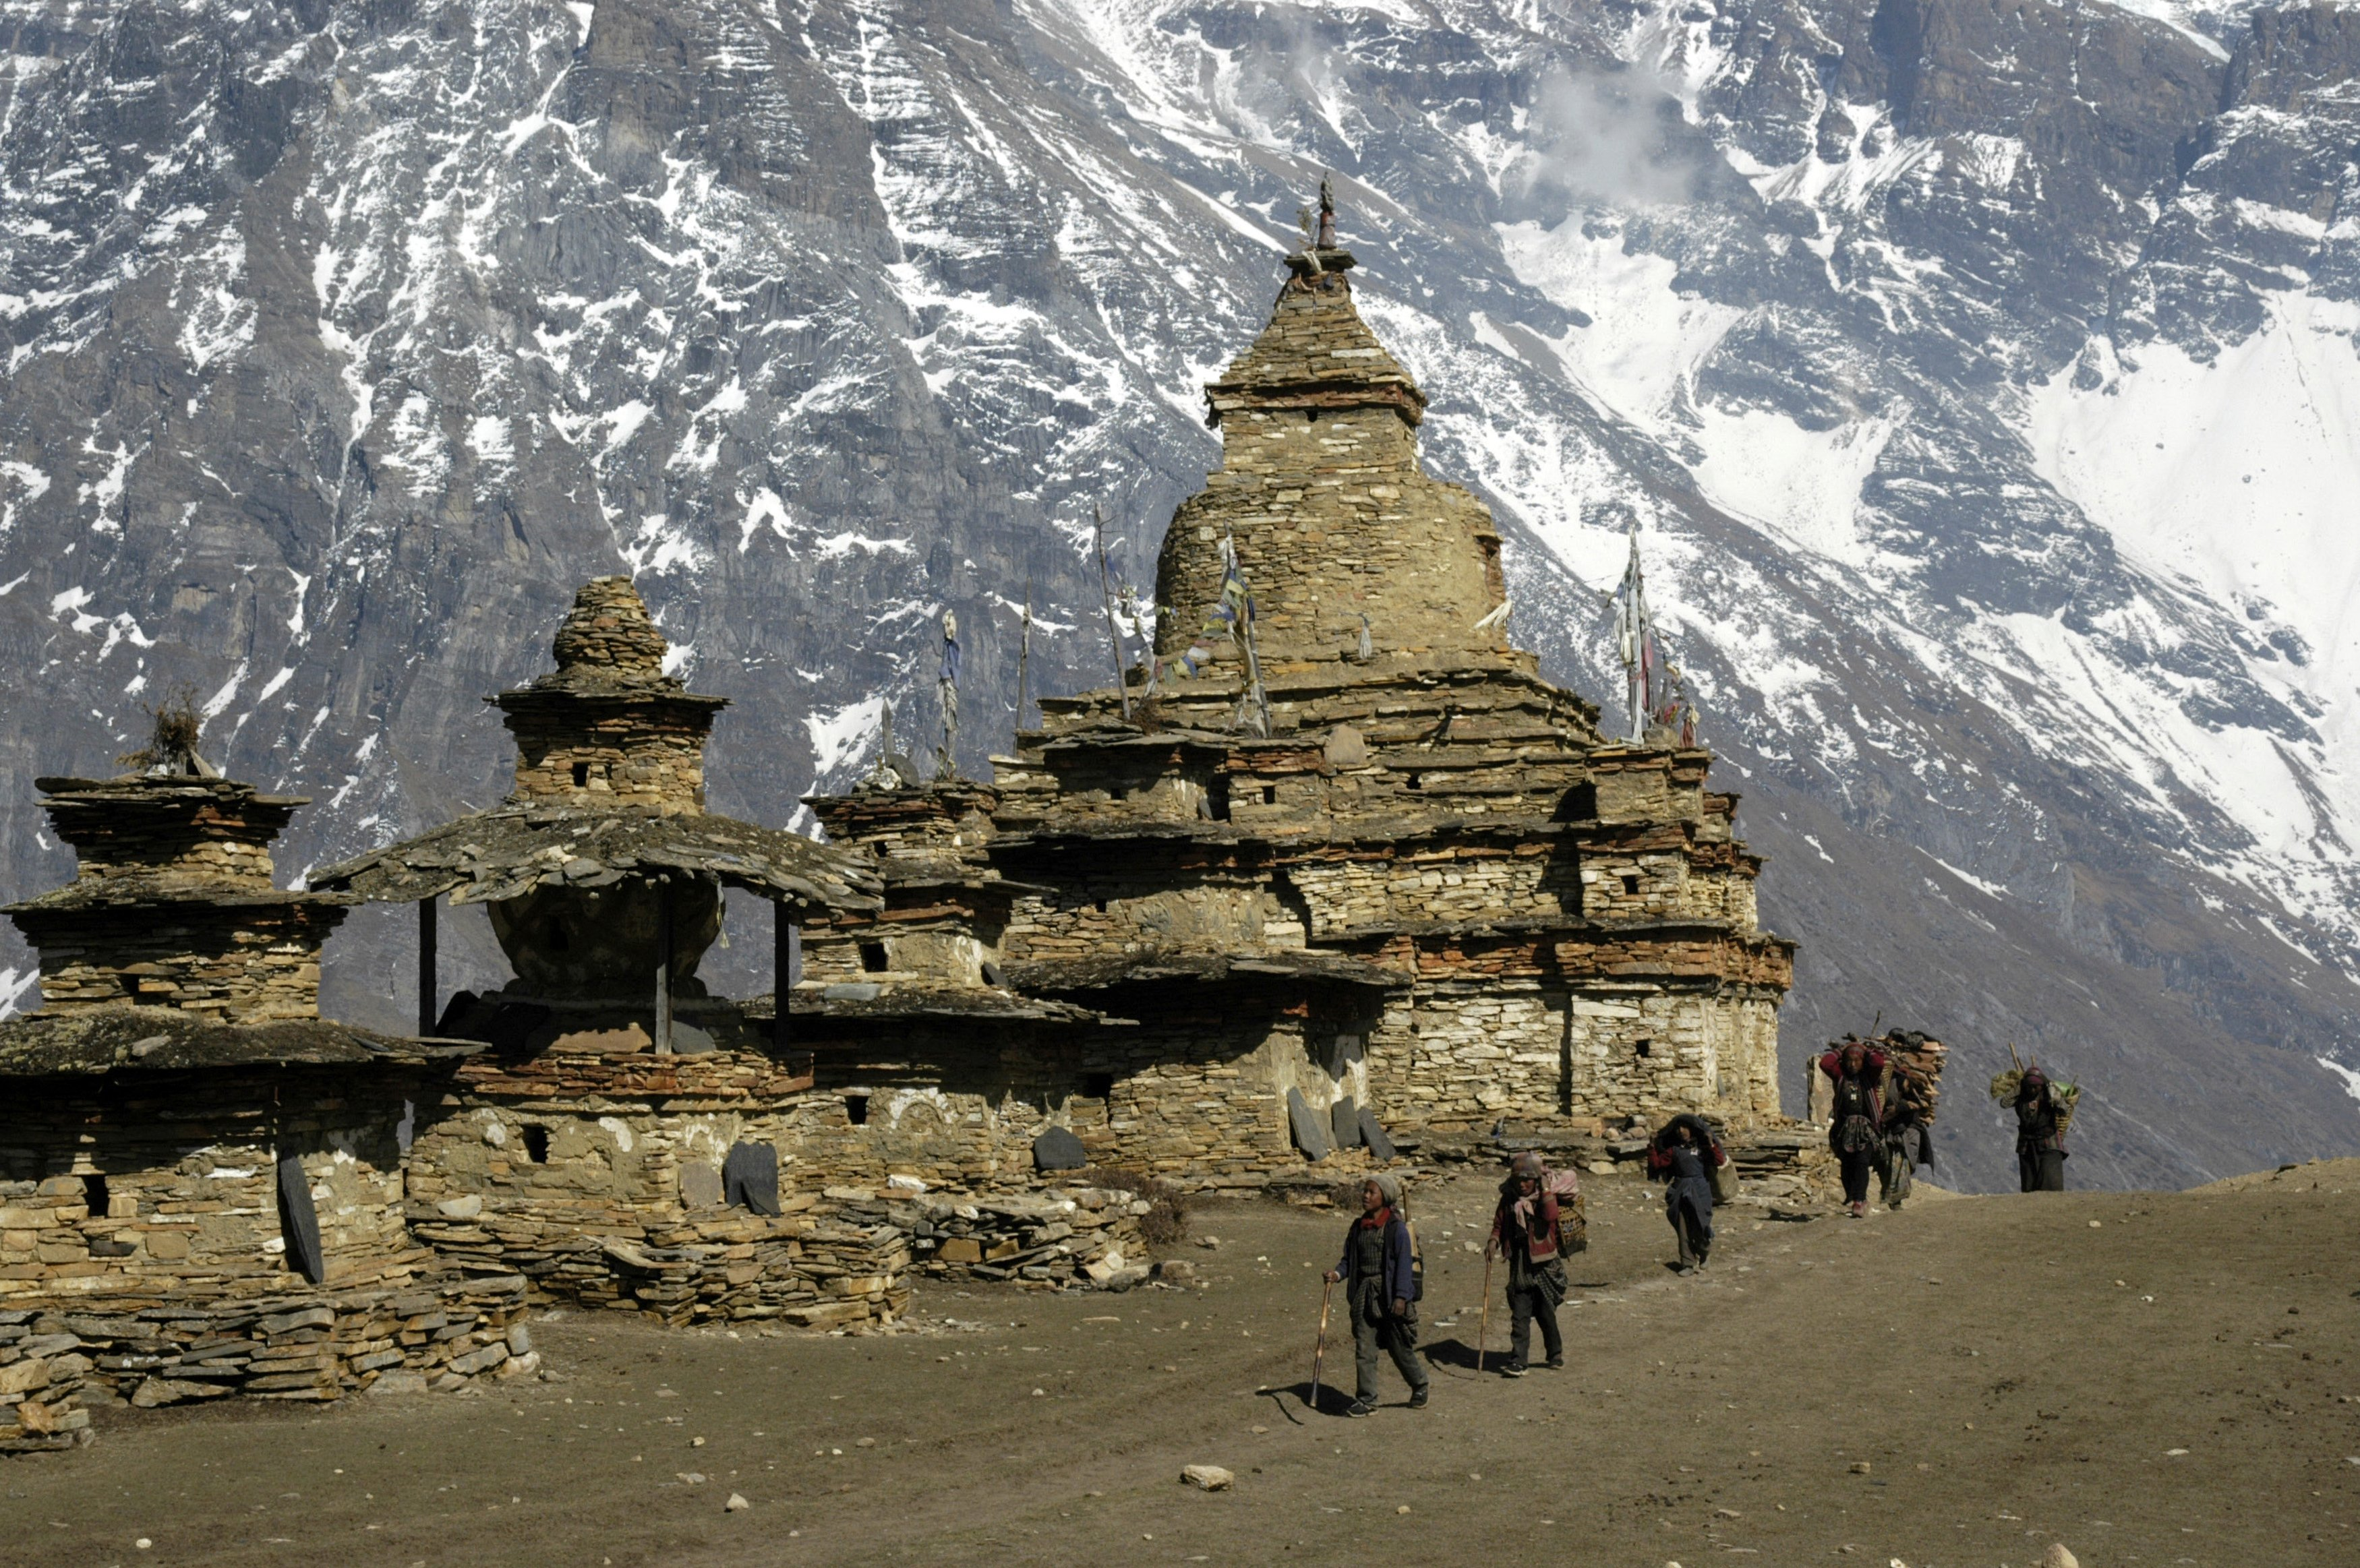 Buddhist temples near mountain Kang Guru in Nepal. Source: Global Look Press